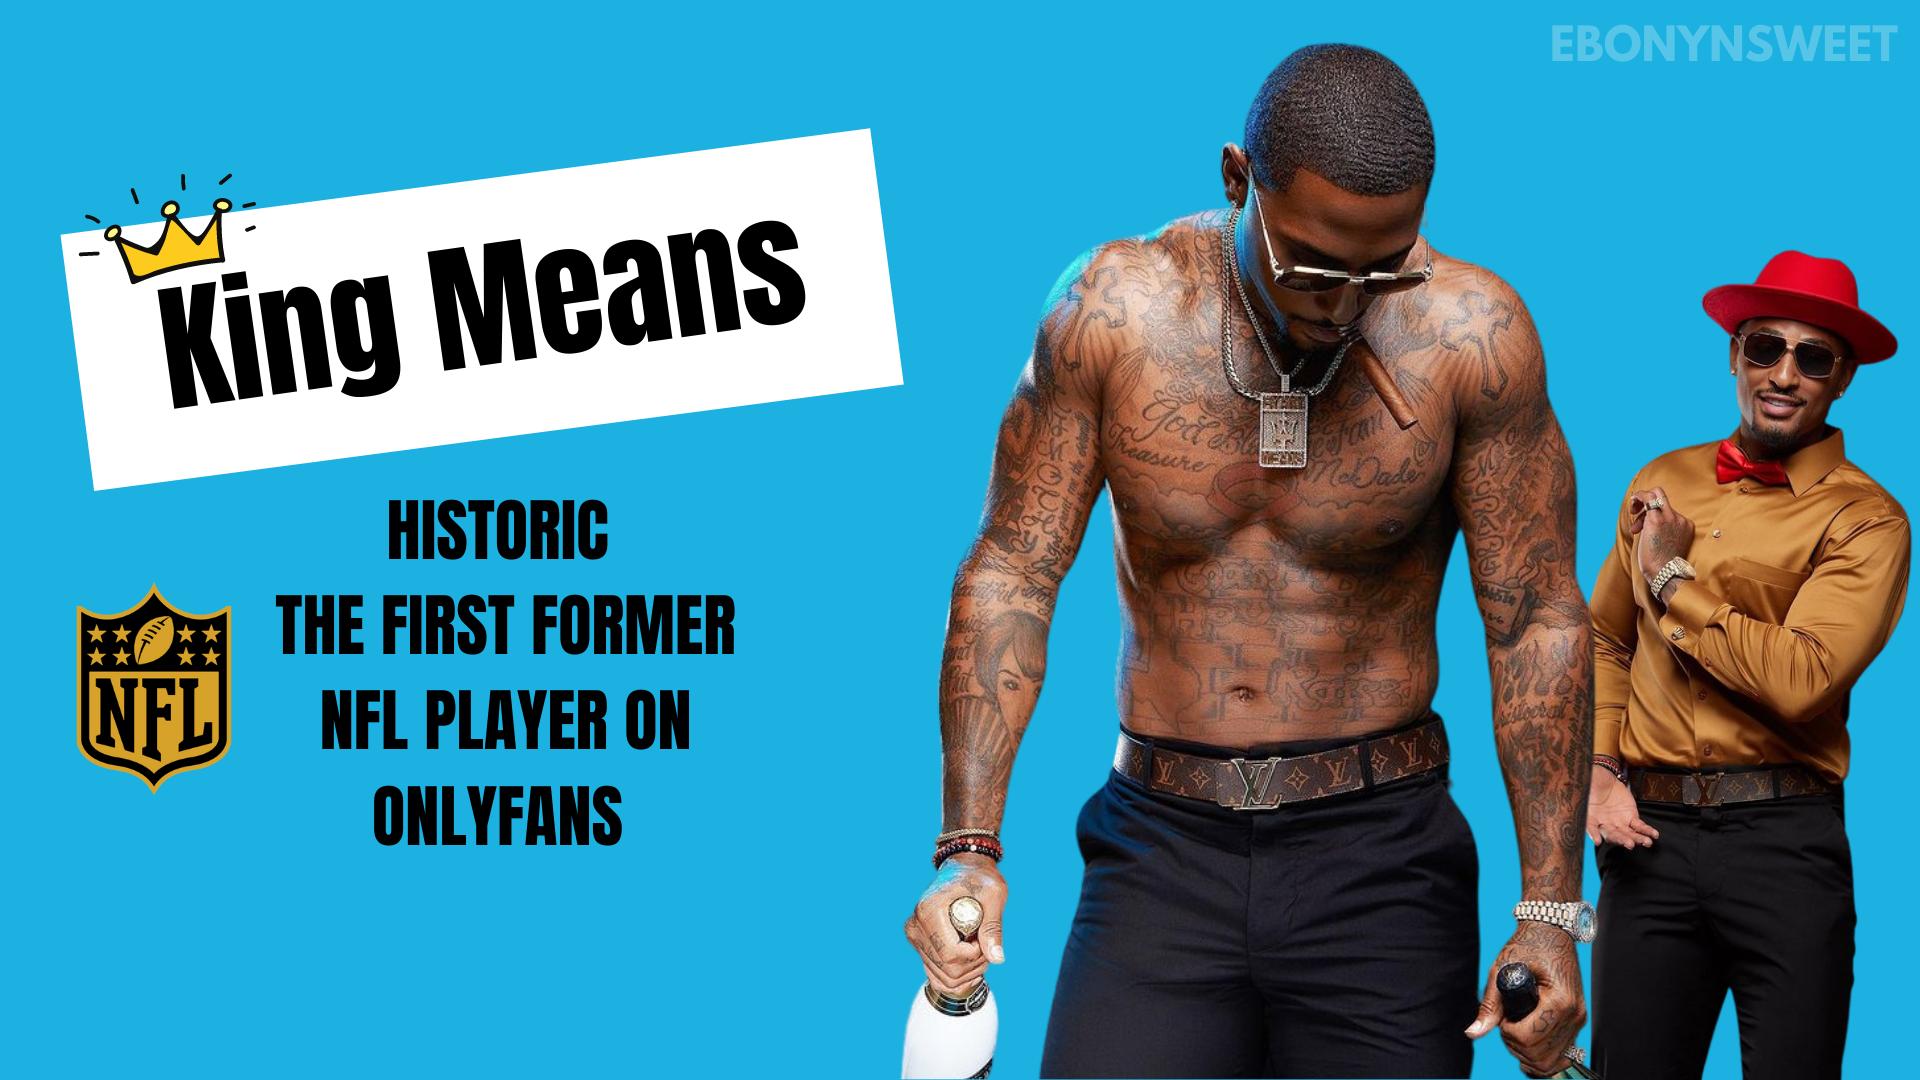 LoMeans, Lo Means, King Means, Loyce Means, NFL Player, NFL, Sports, onlyfans, NFL Player nude, NFL Player dick, lockerroom, Nude Lockerroom, Greenbay packers, Texans, Nude Texas, Black Nude Football Player, Nude Football player